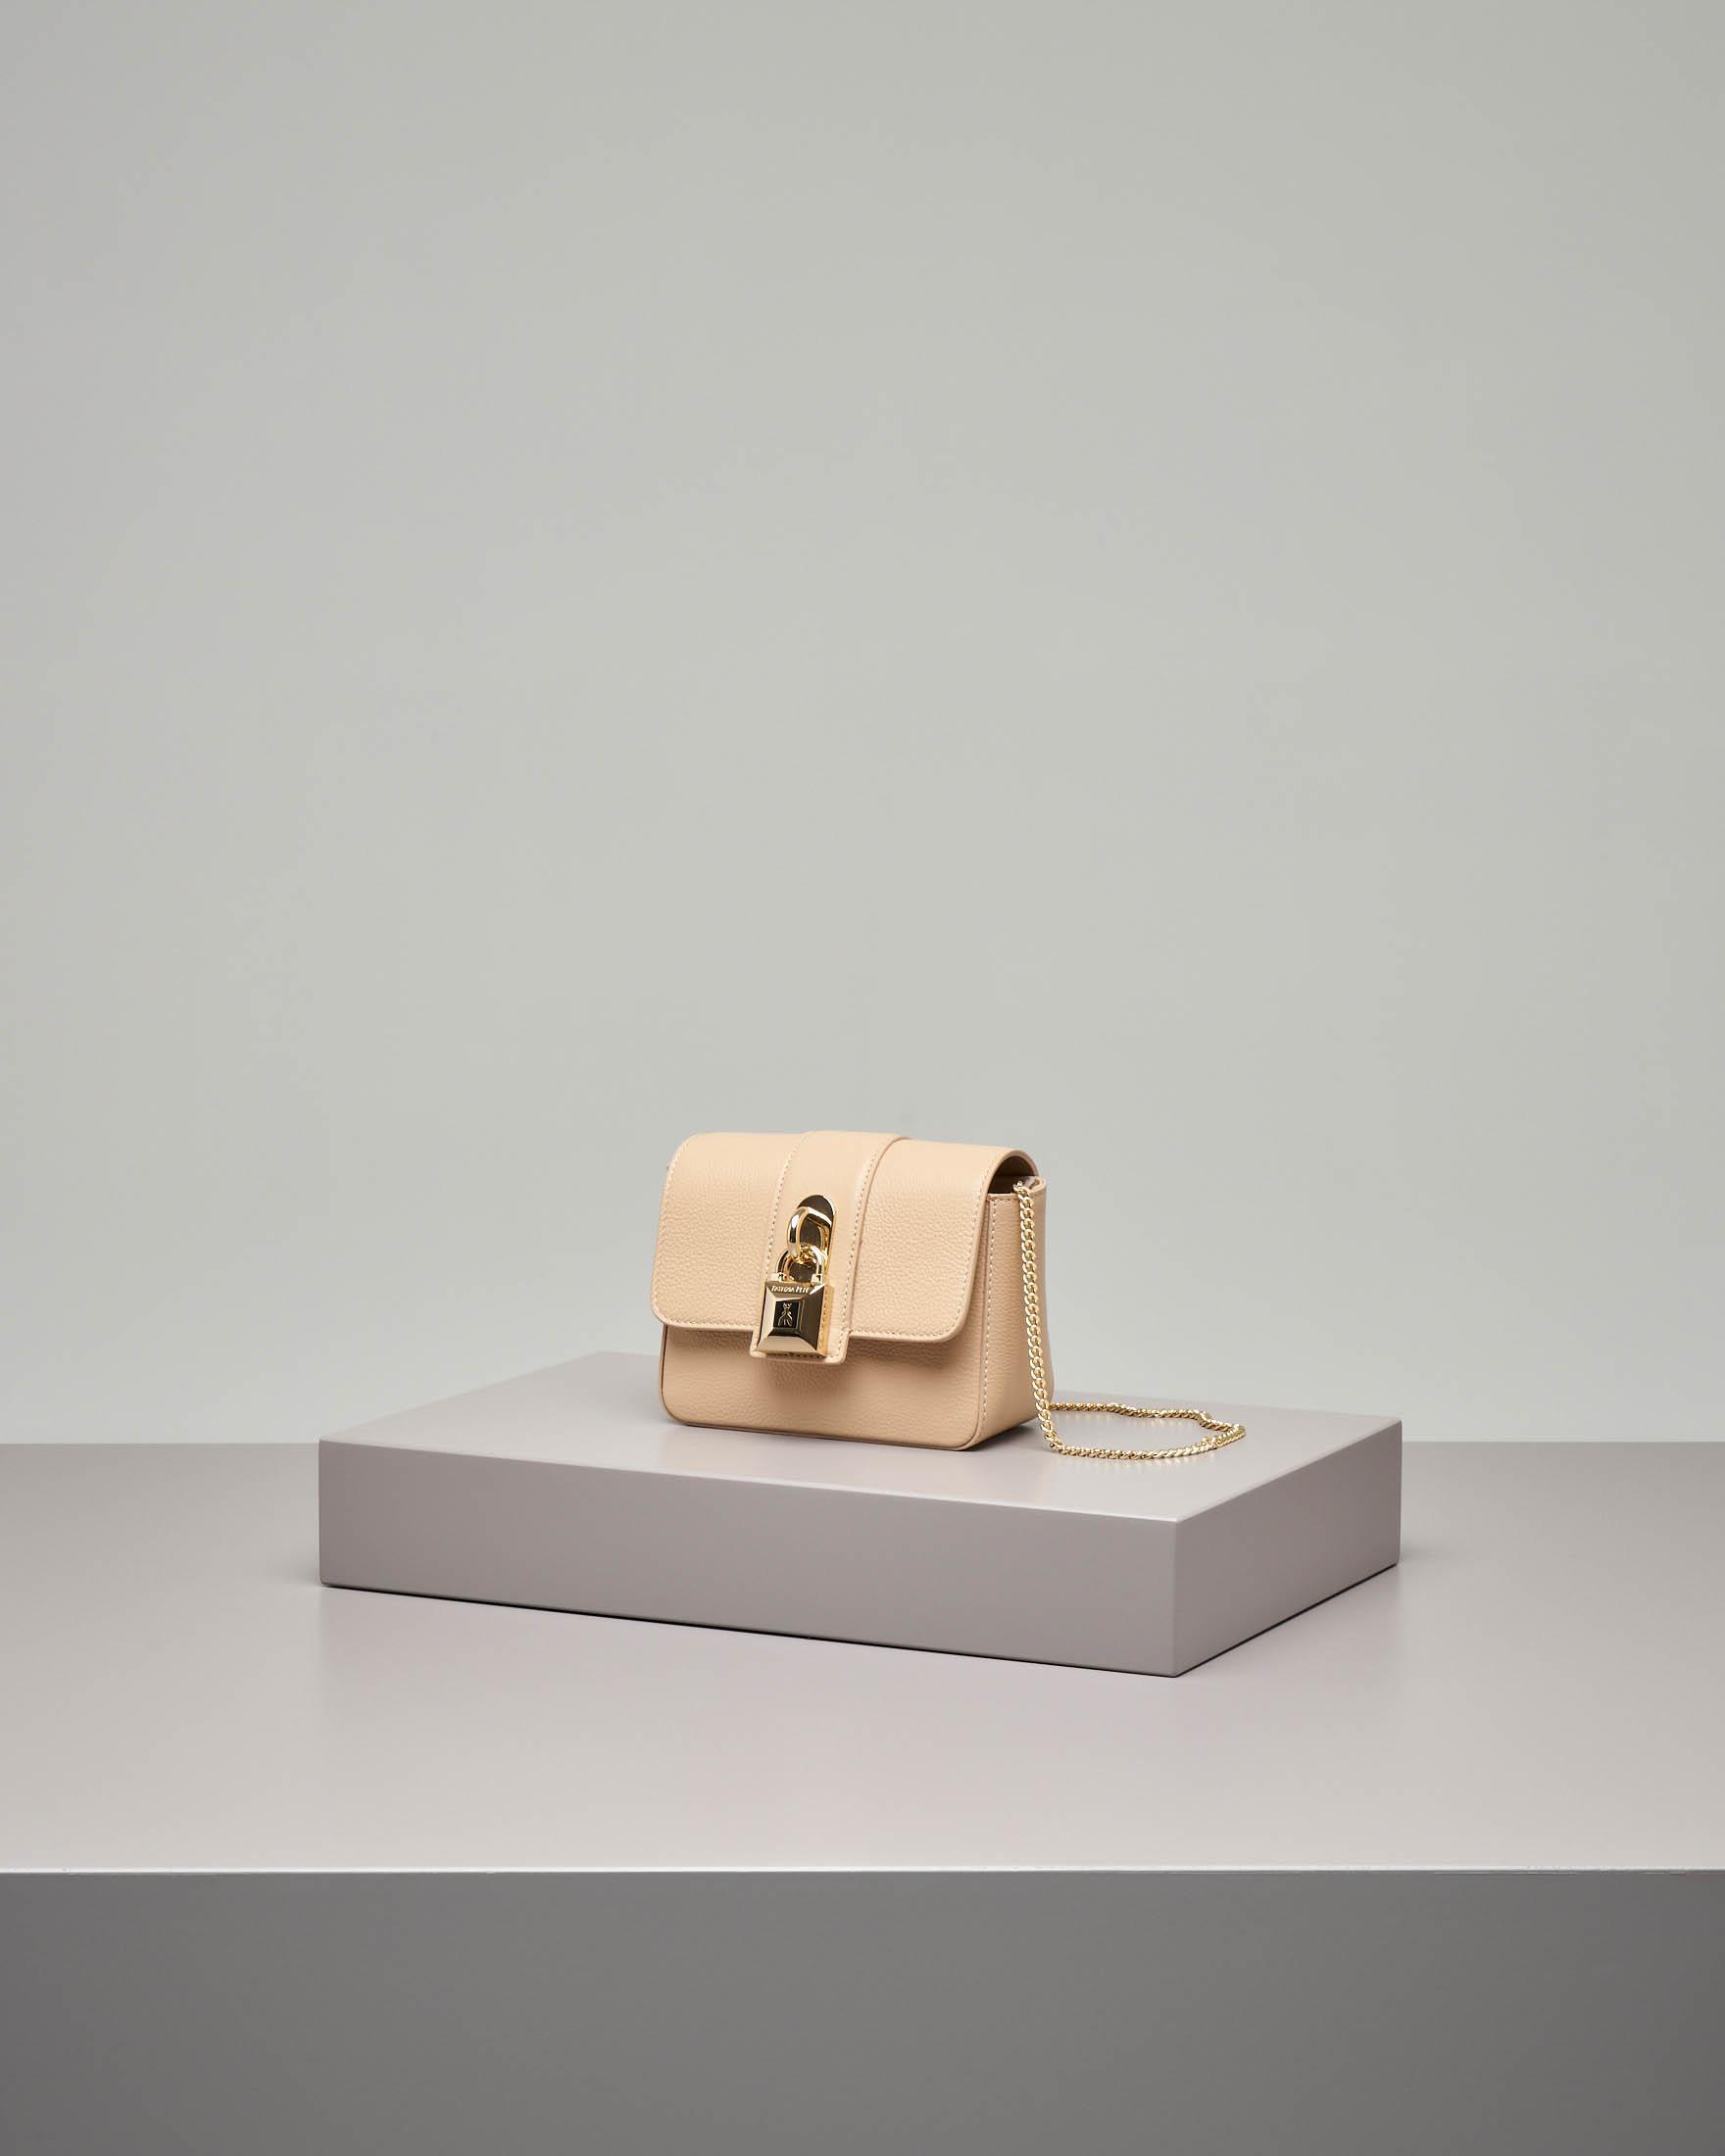 Cross bag mini in pelle beige con catena